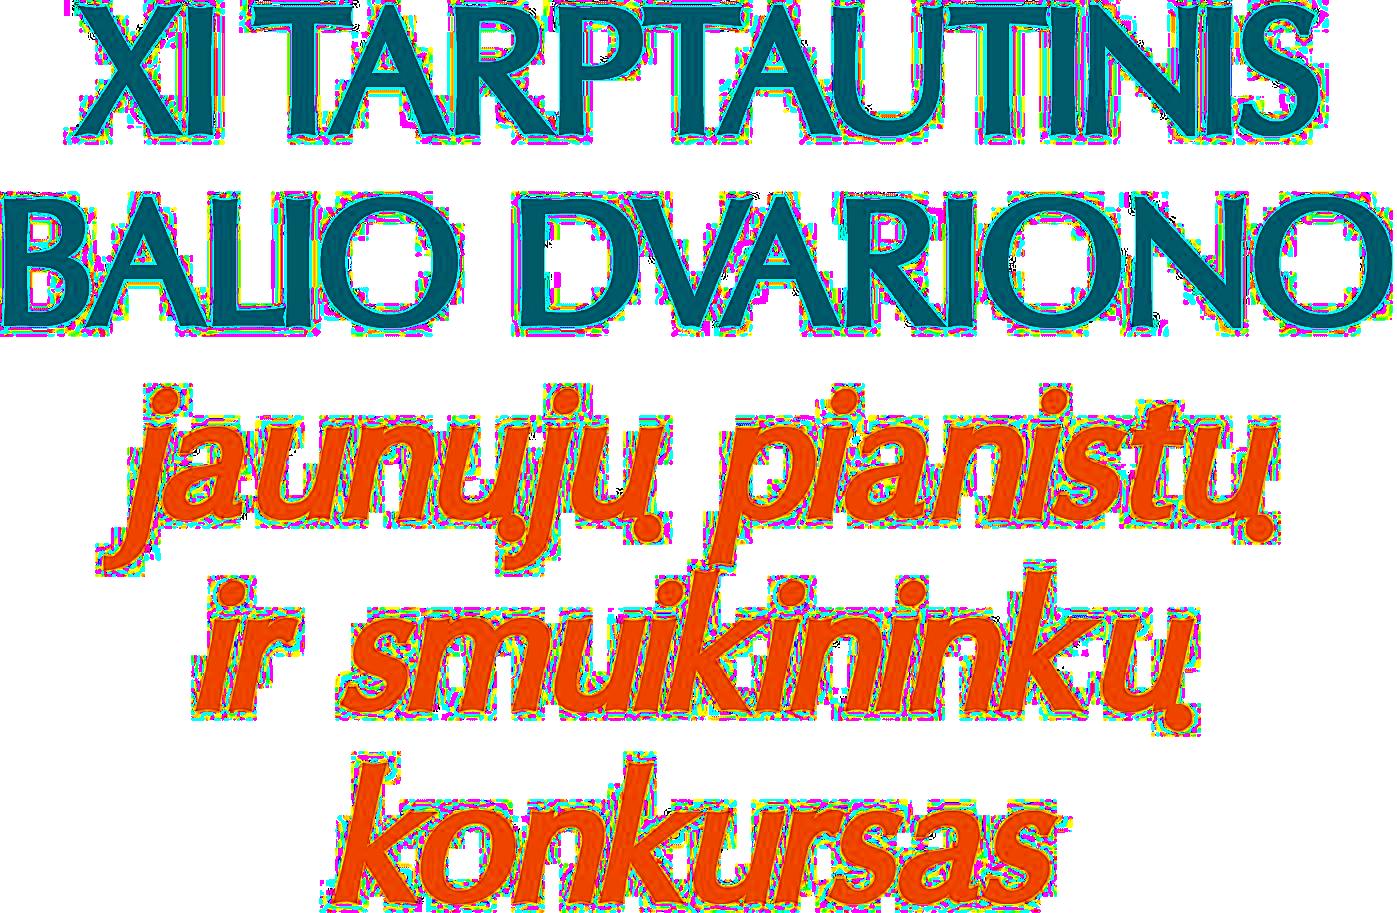 Dvarionas